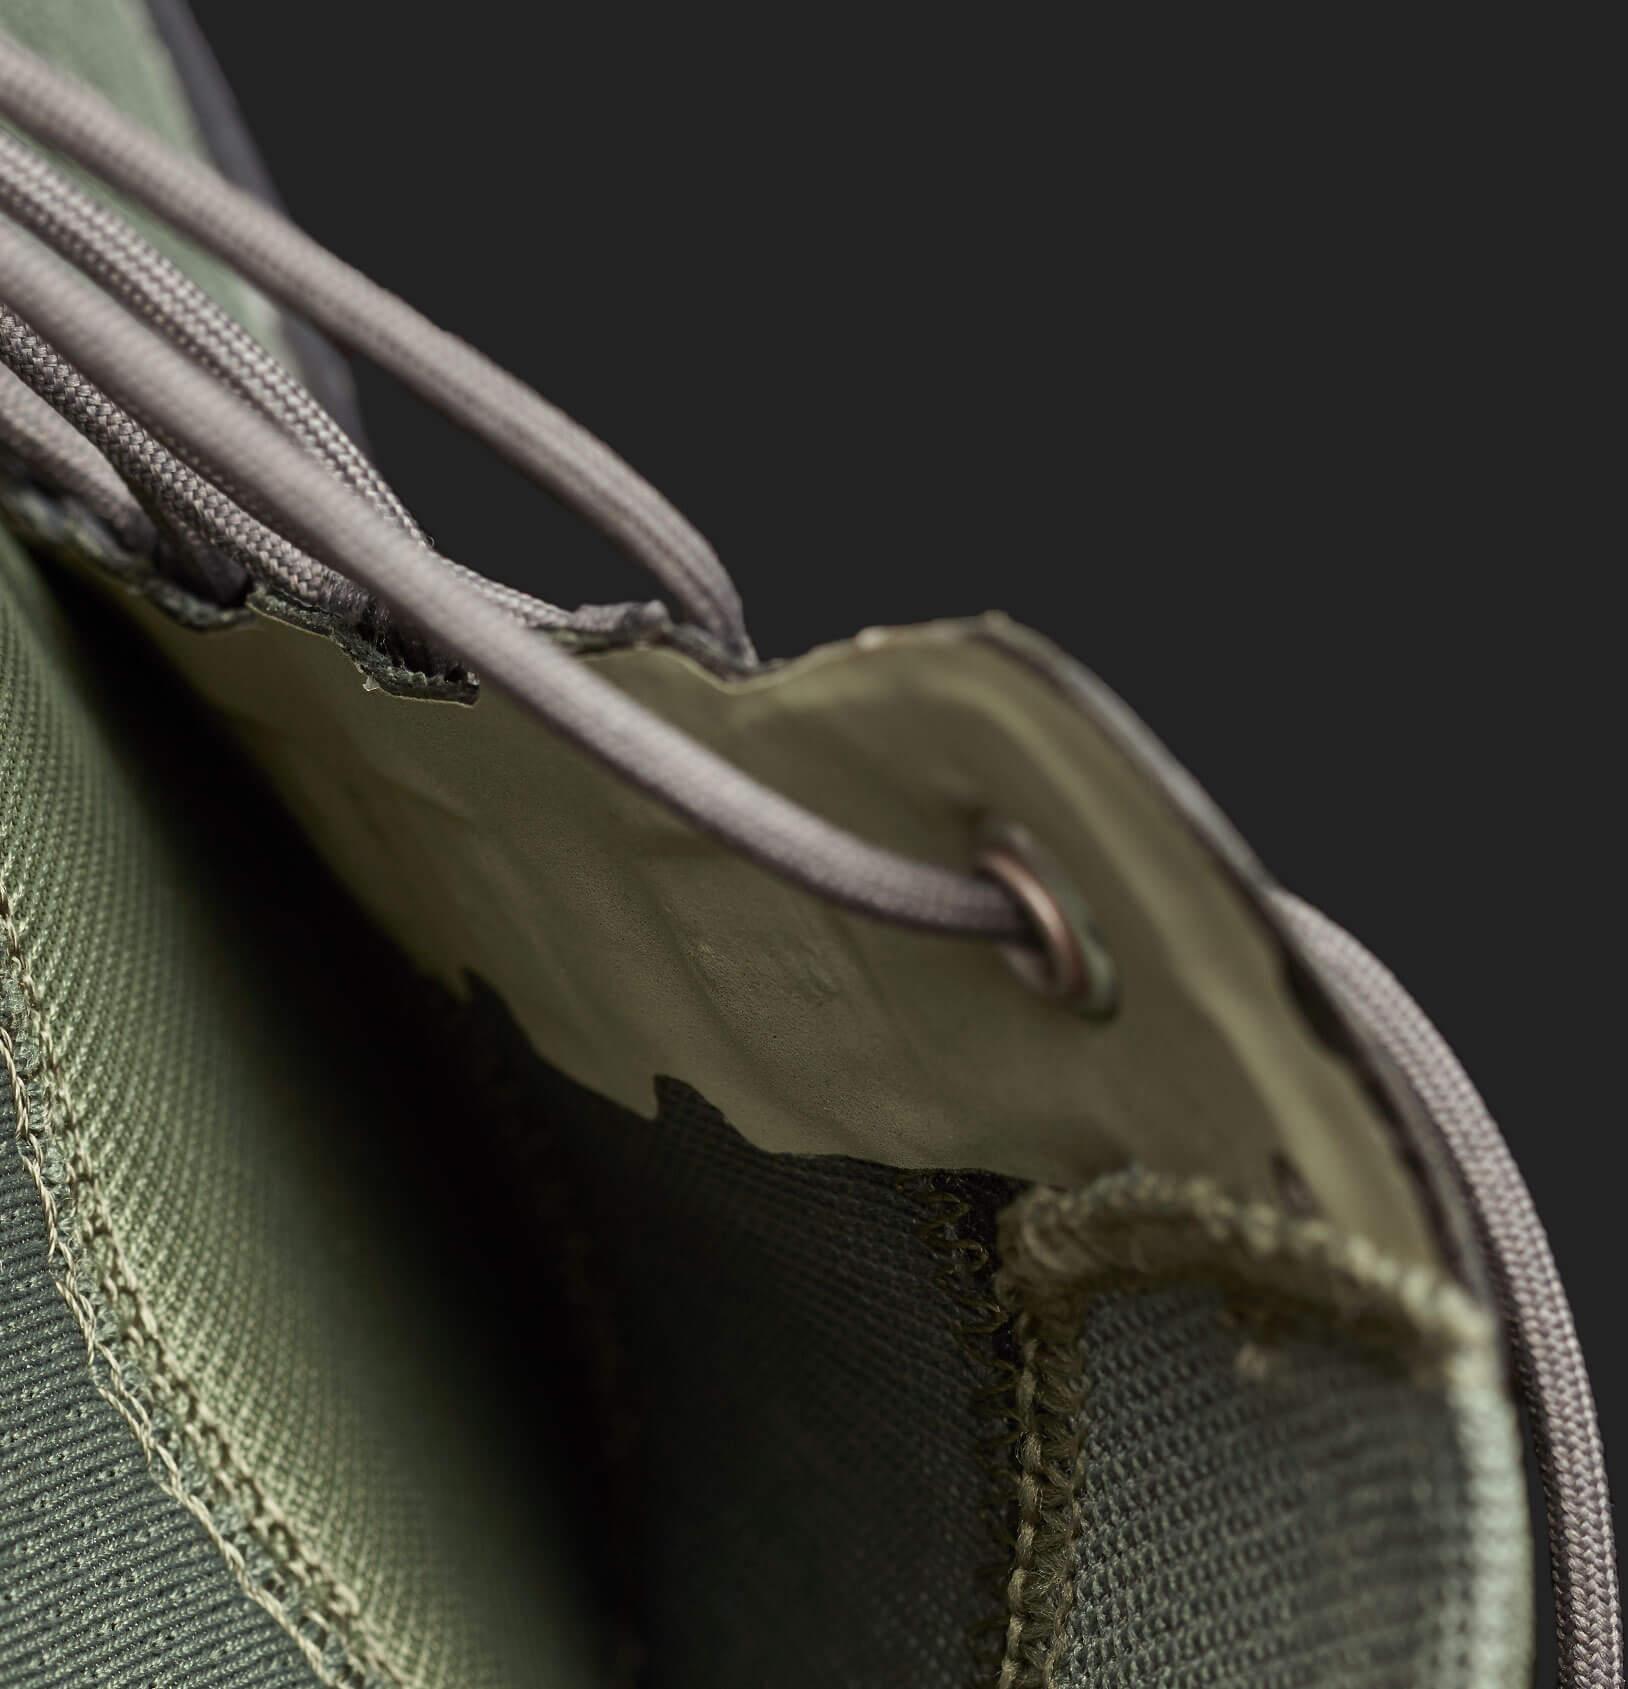 Leichtes, komfortables 2-Lagen-Obermaterial